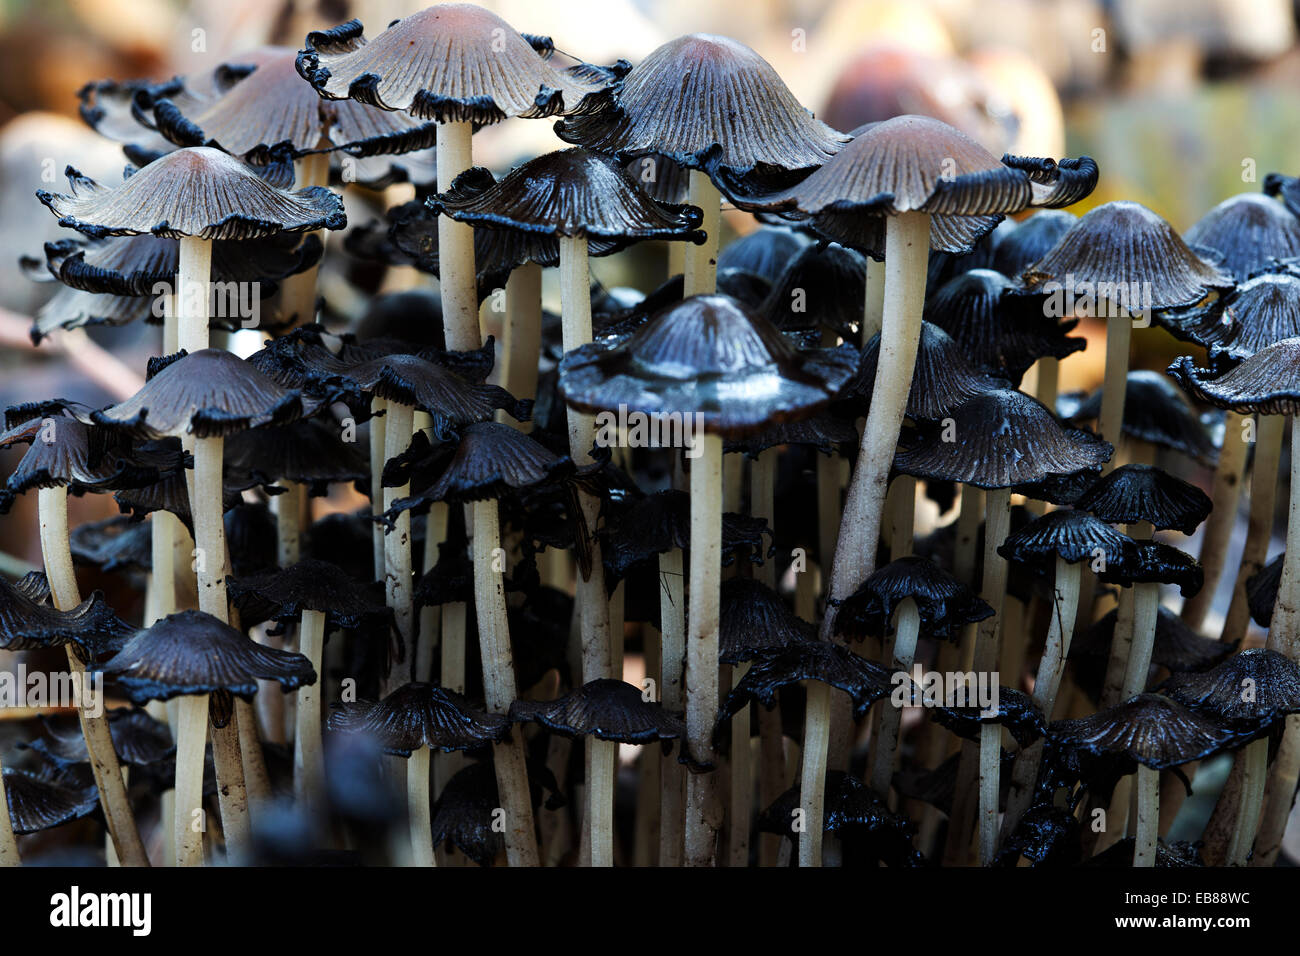 Declining Fairies Bonnets mushrooms (Coprinellus disseminatus, syn. Coprinus disseminatus) - Stock Image